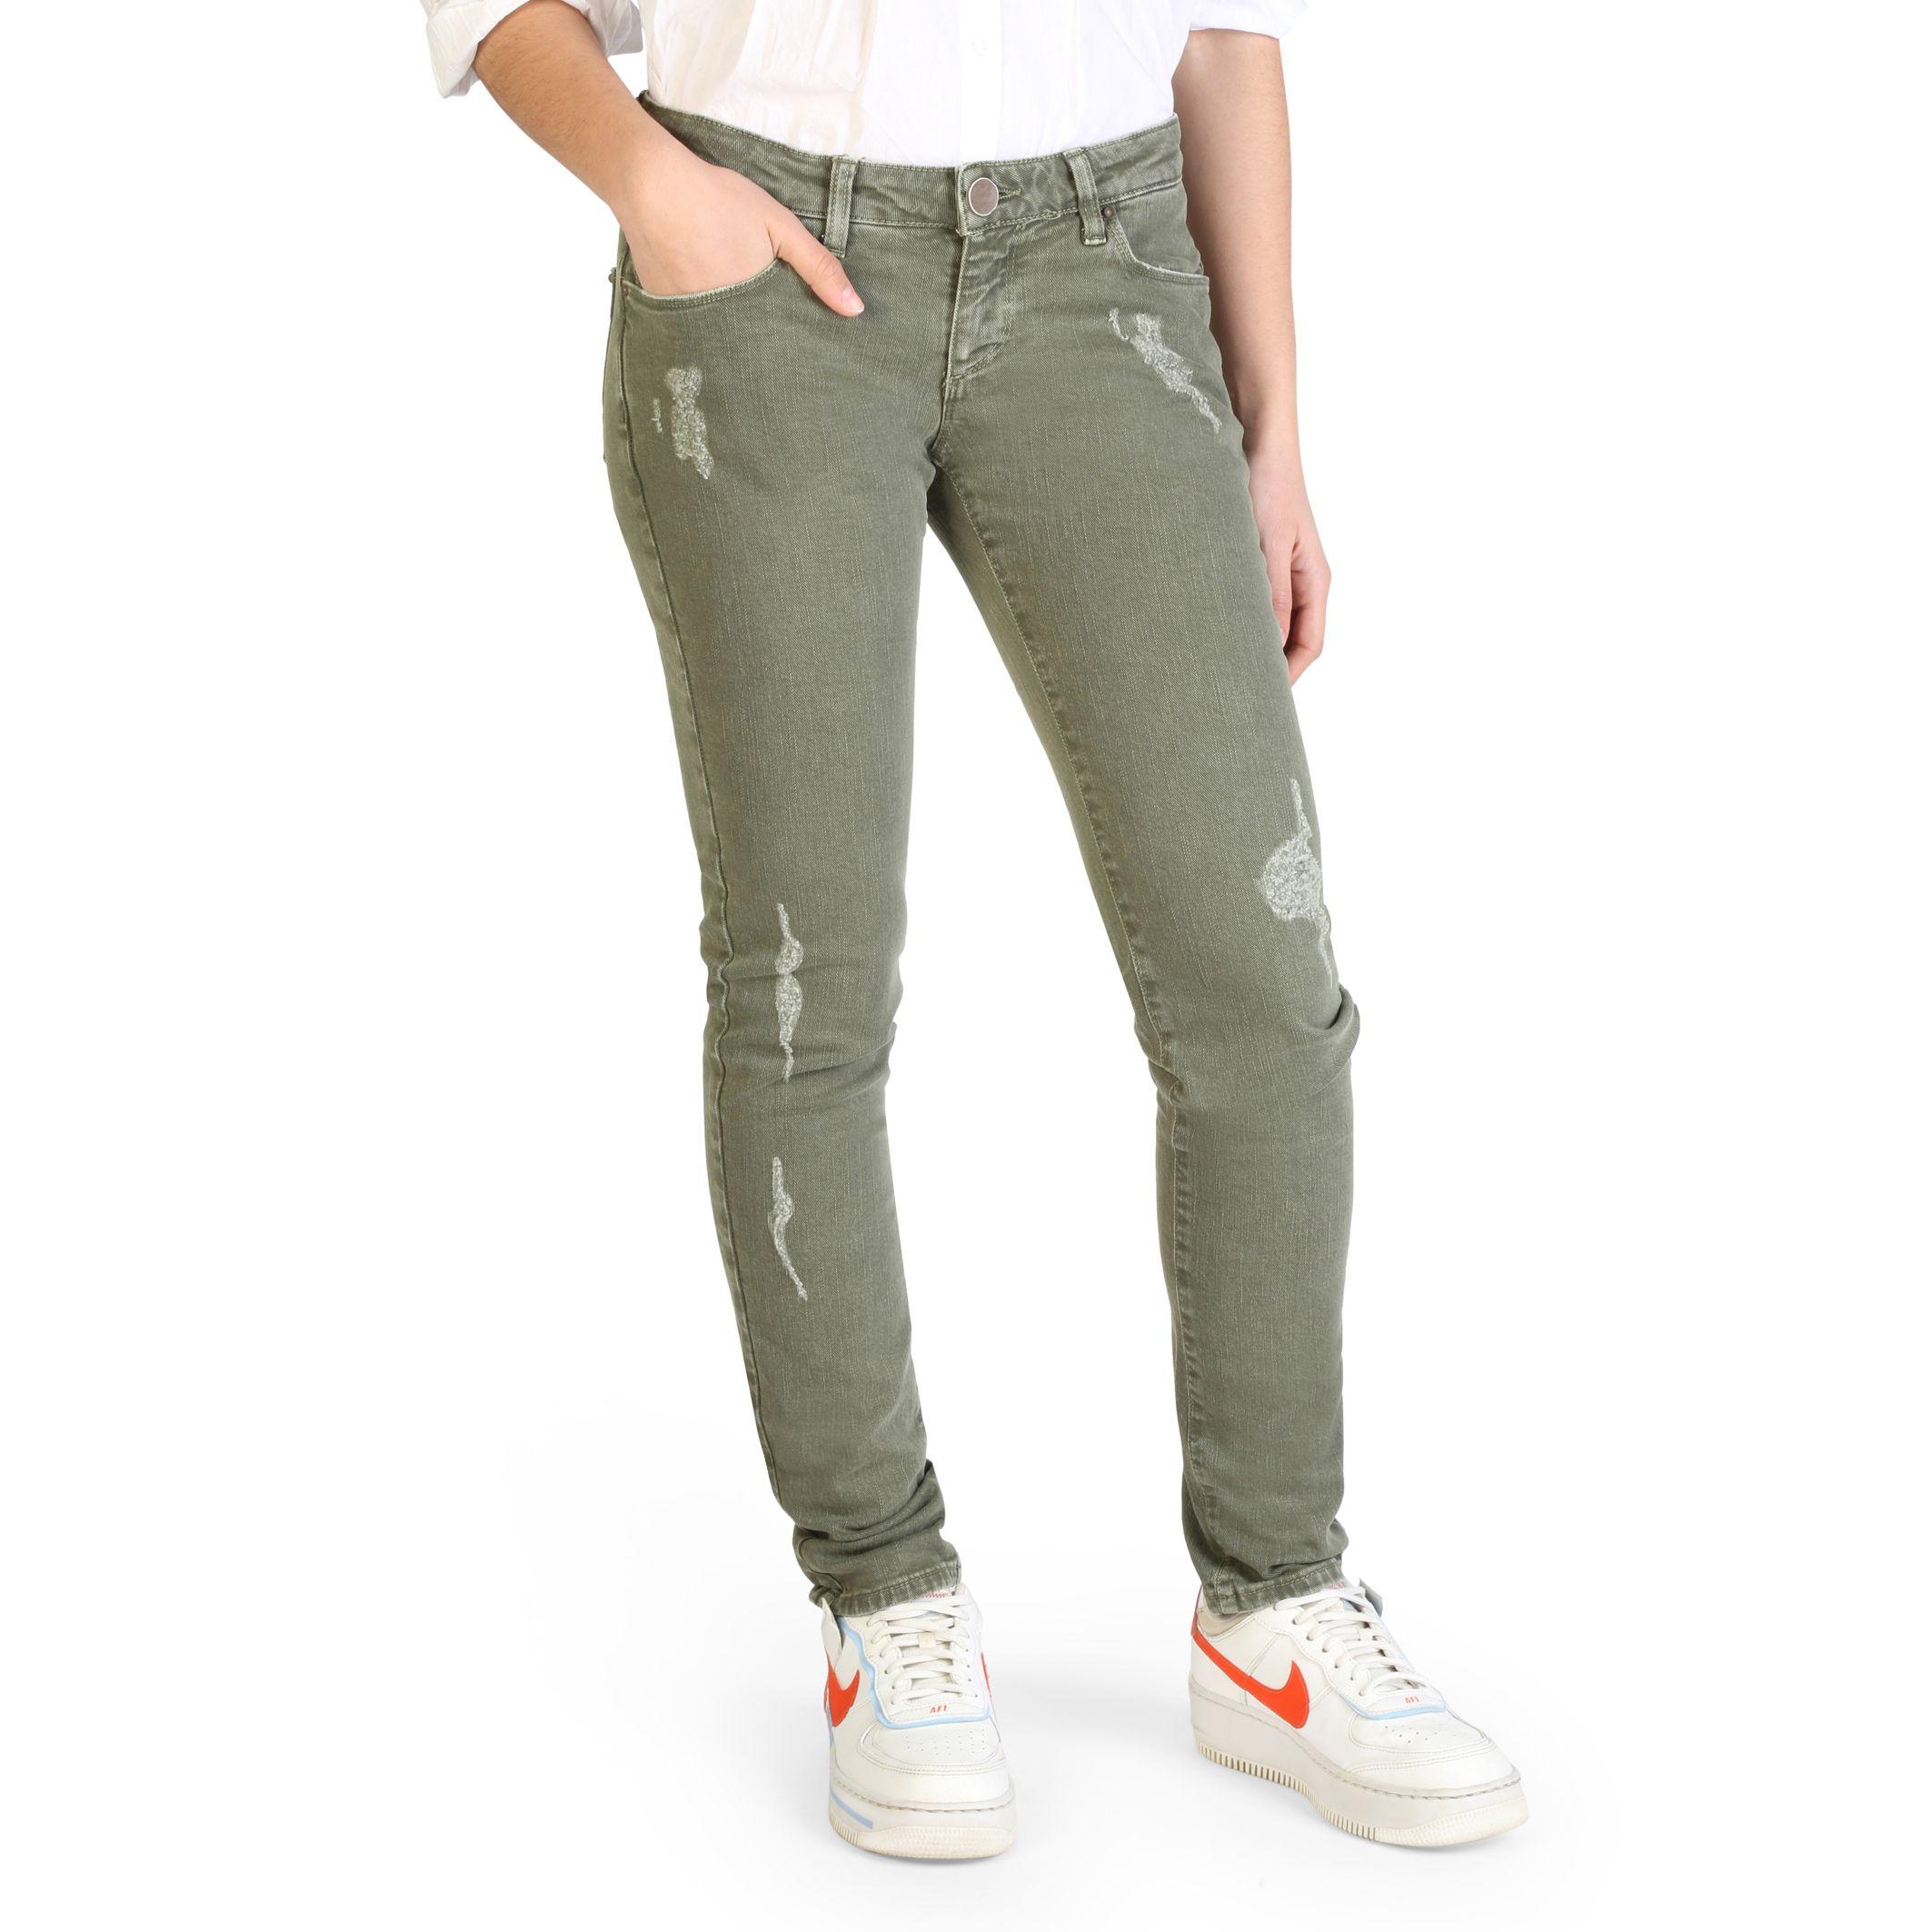 Carrera Jeans – 777-9302A